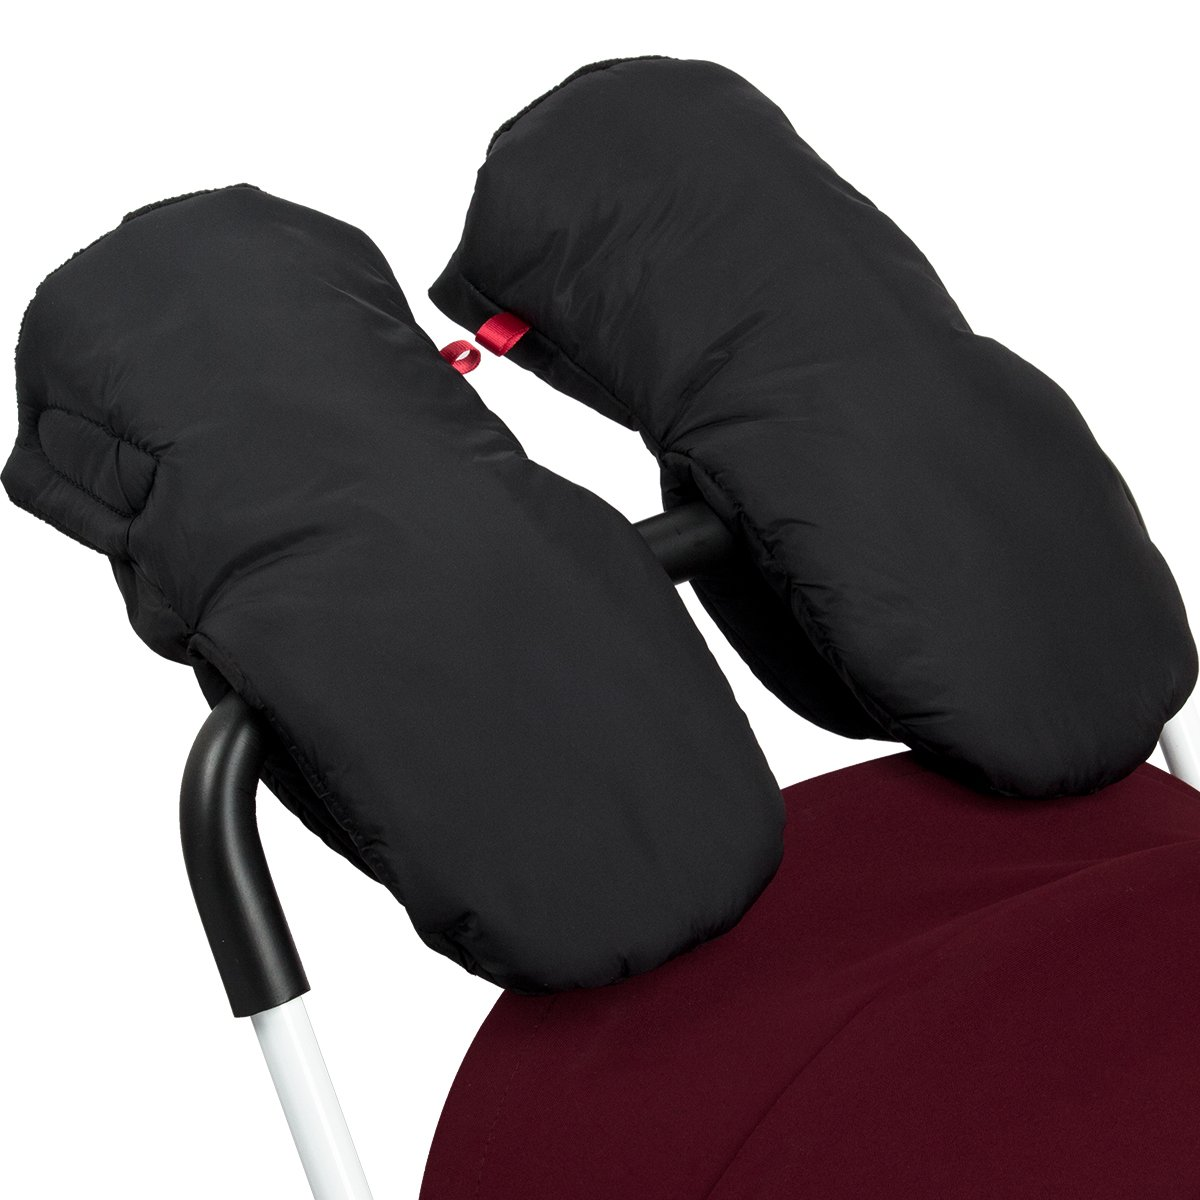 Biubee Stroller Hand Muff Winter Warm Pram Mitten Gloves for Parents and Caregivers Waterproof Anti-Freeze Black by Biubee (Image #1)